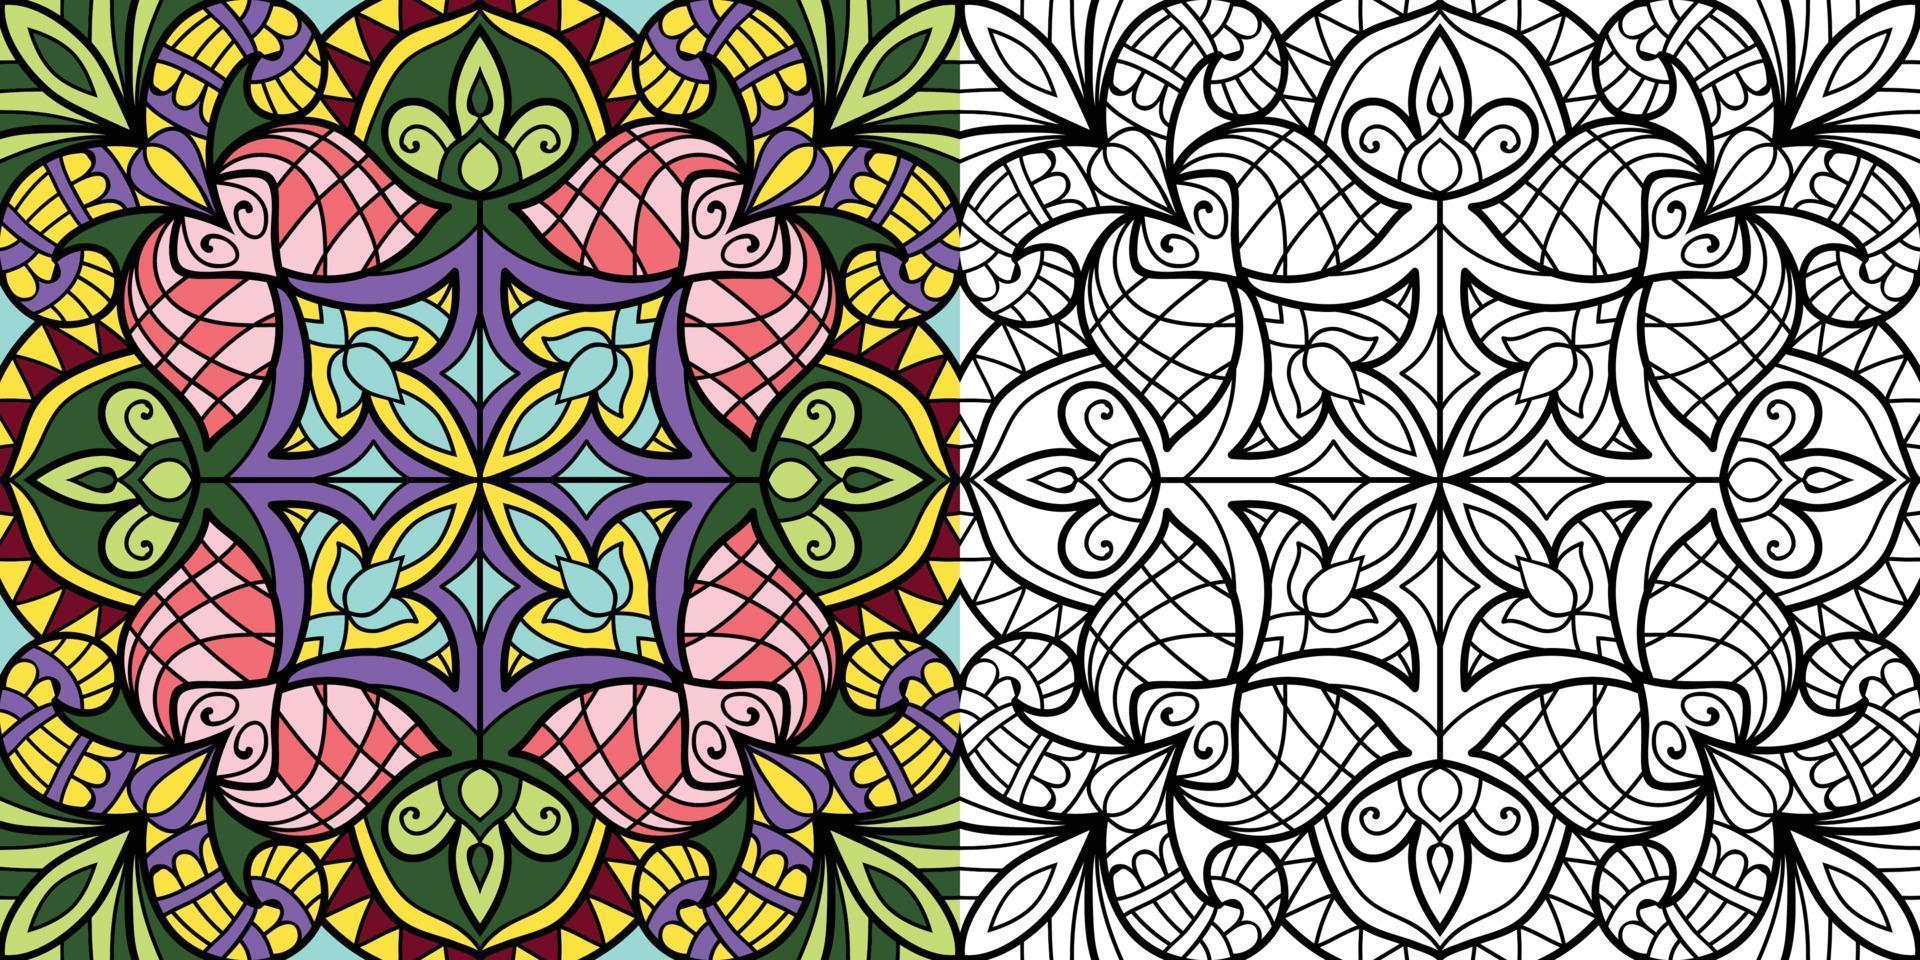 Mandala Design Malbuchseite für Erwachsene Illustration vektor